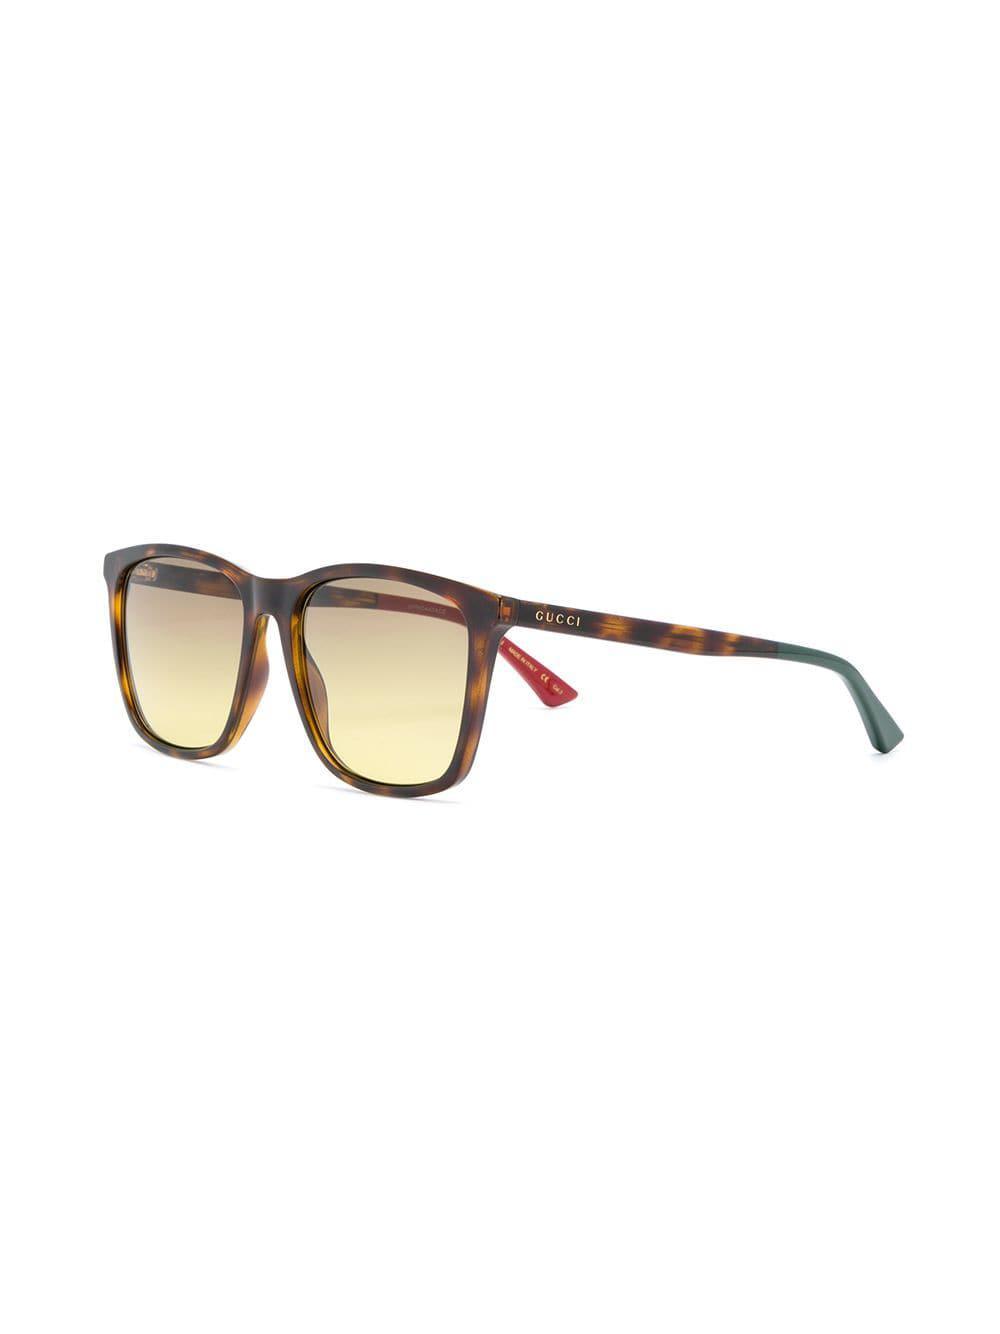 1cb7f368014 Gucci Square Tinted Sunglasses in Brown - Lyst